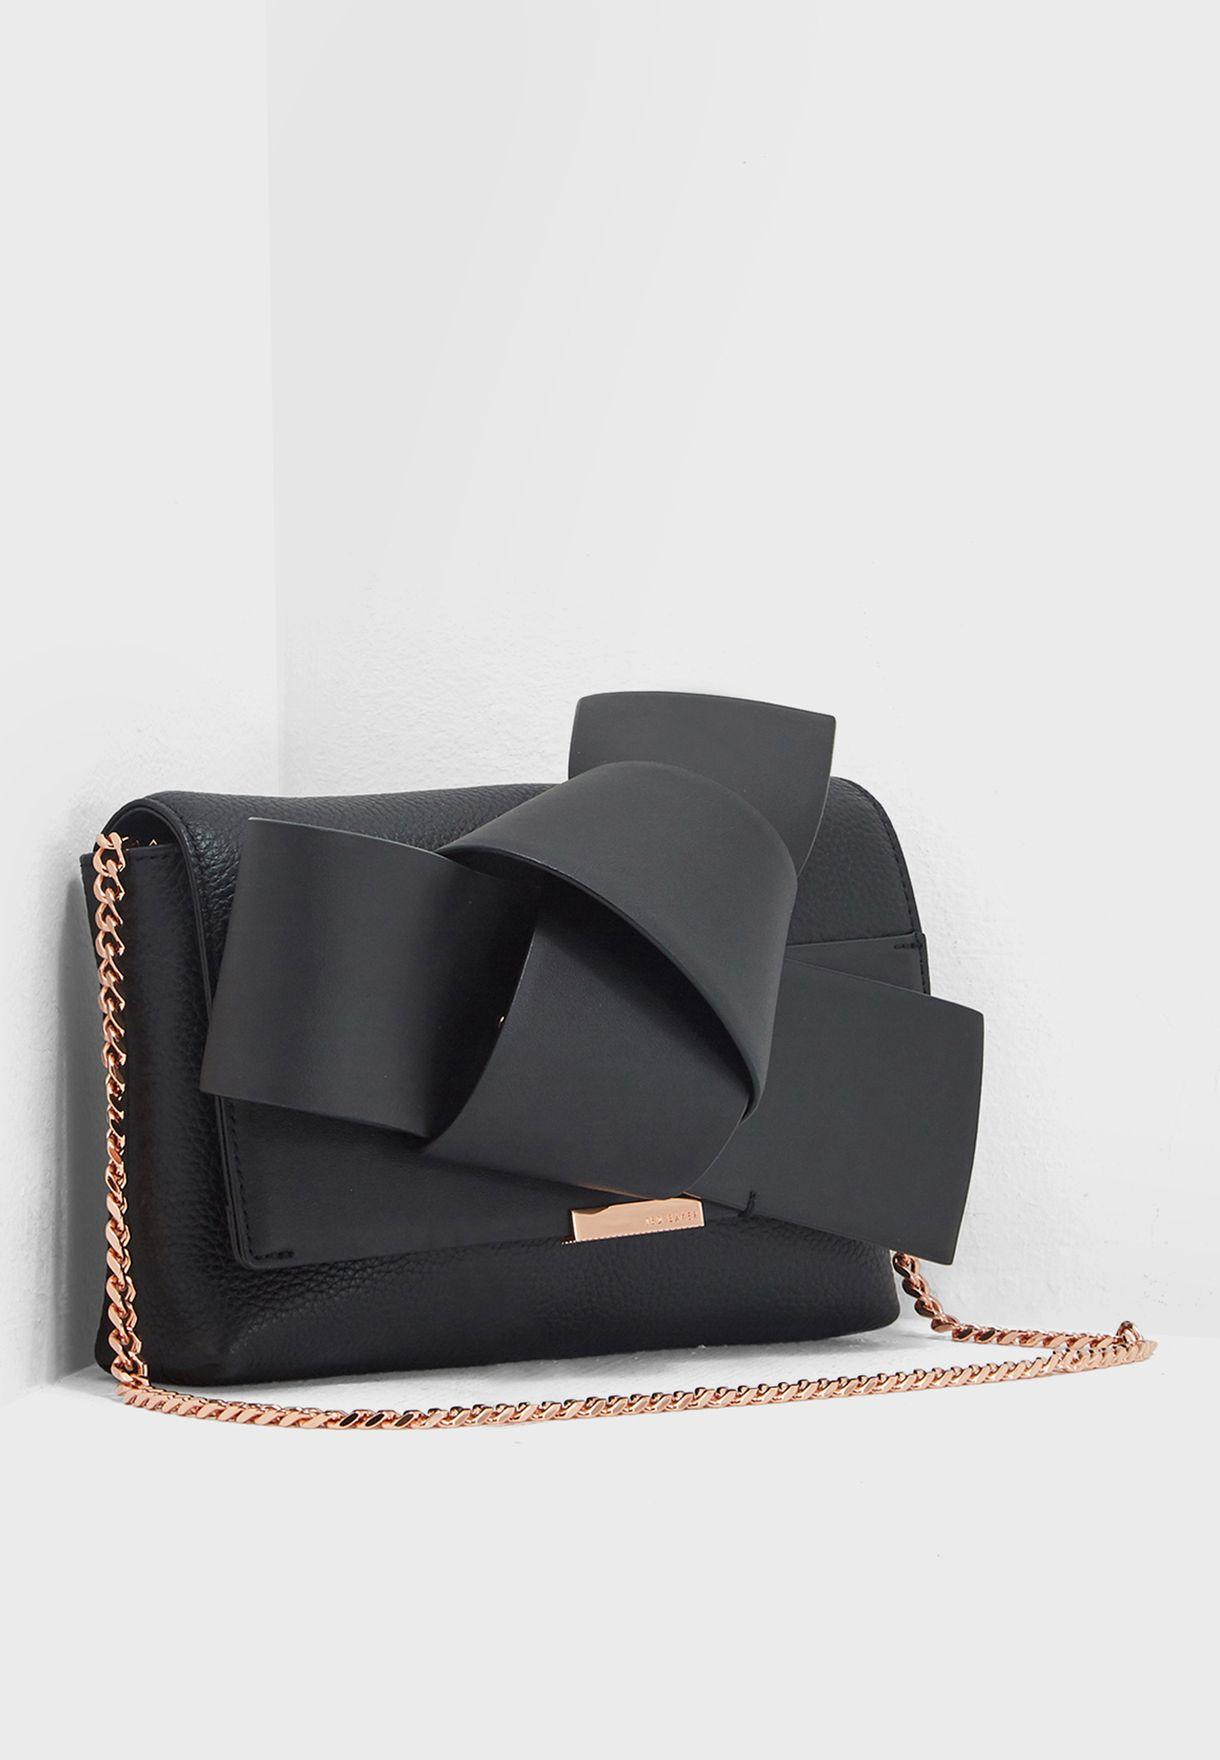 7cb4708e4 Shop Ted baker black Agentah Knot Bow Bag 145765 for Women in Saudi -  TE456AC38XBP